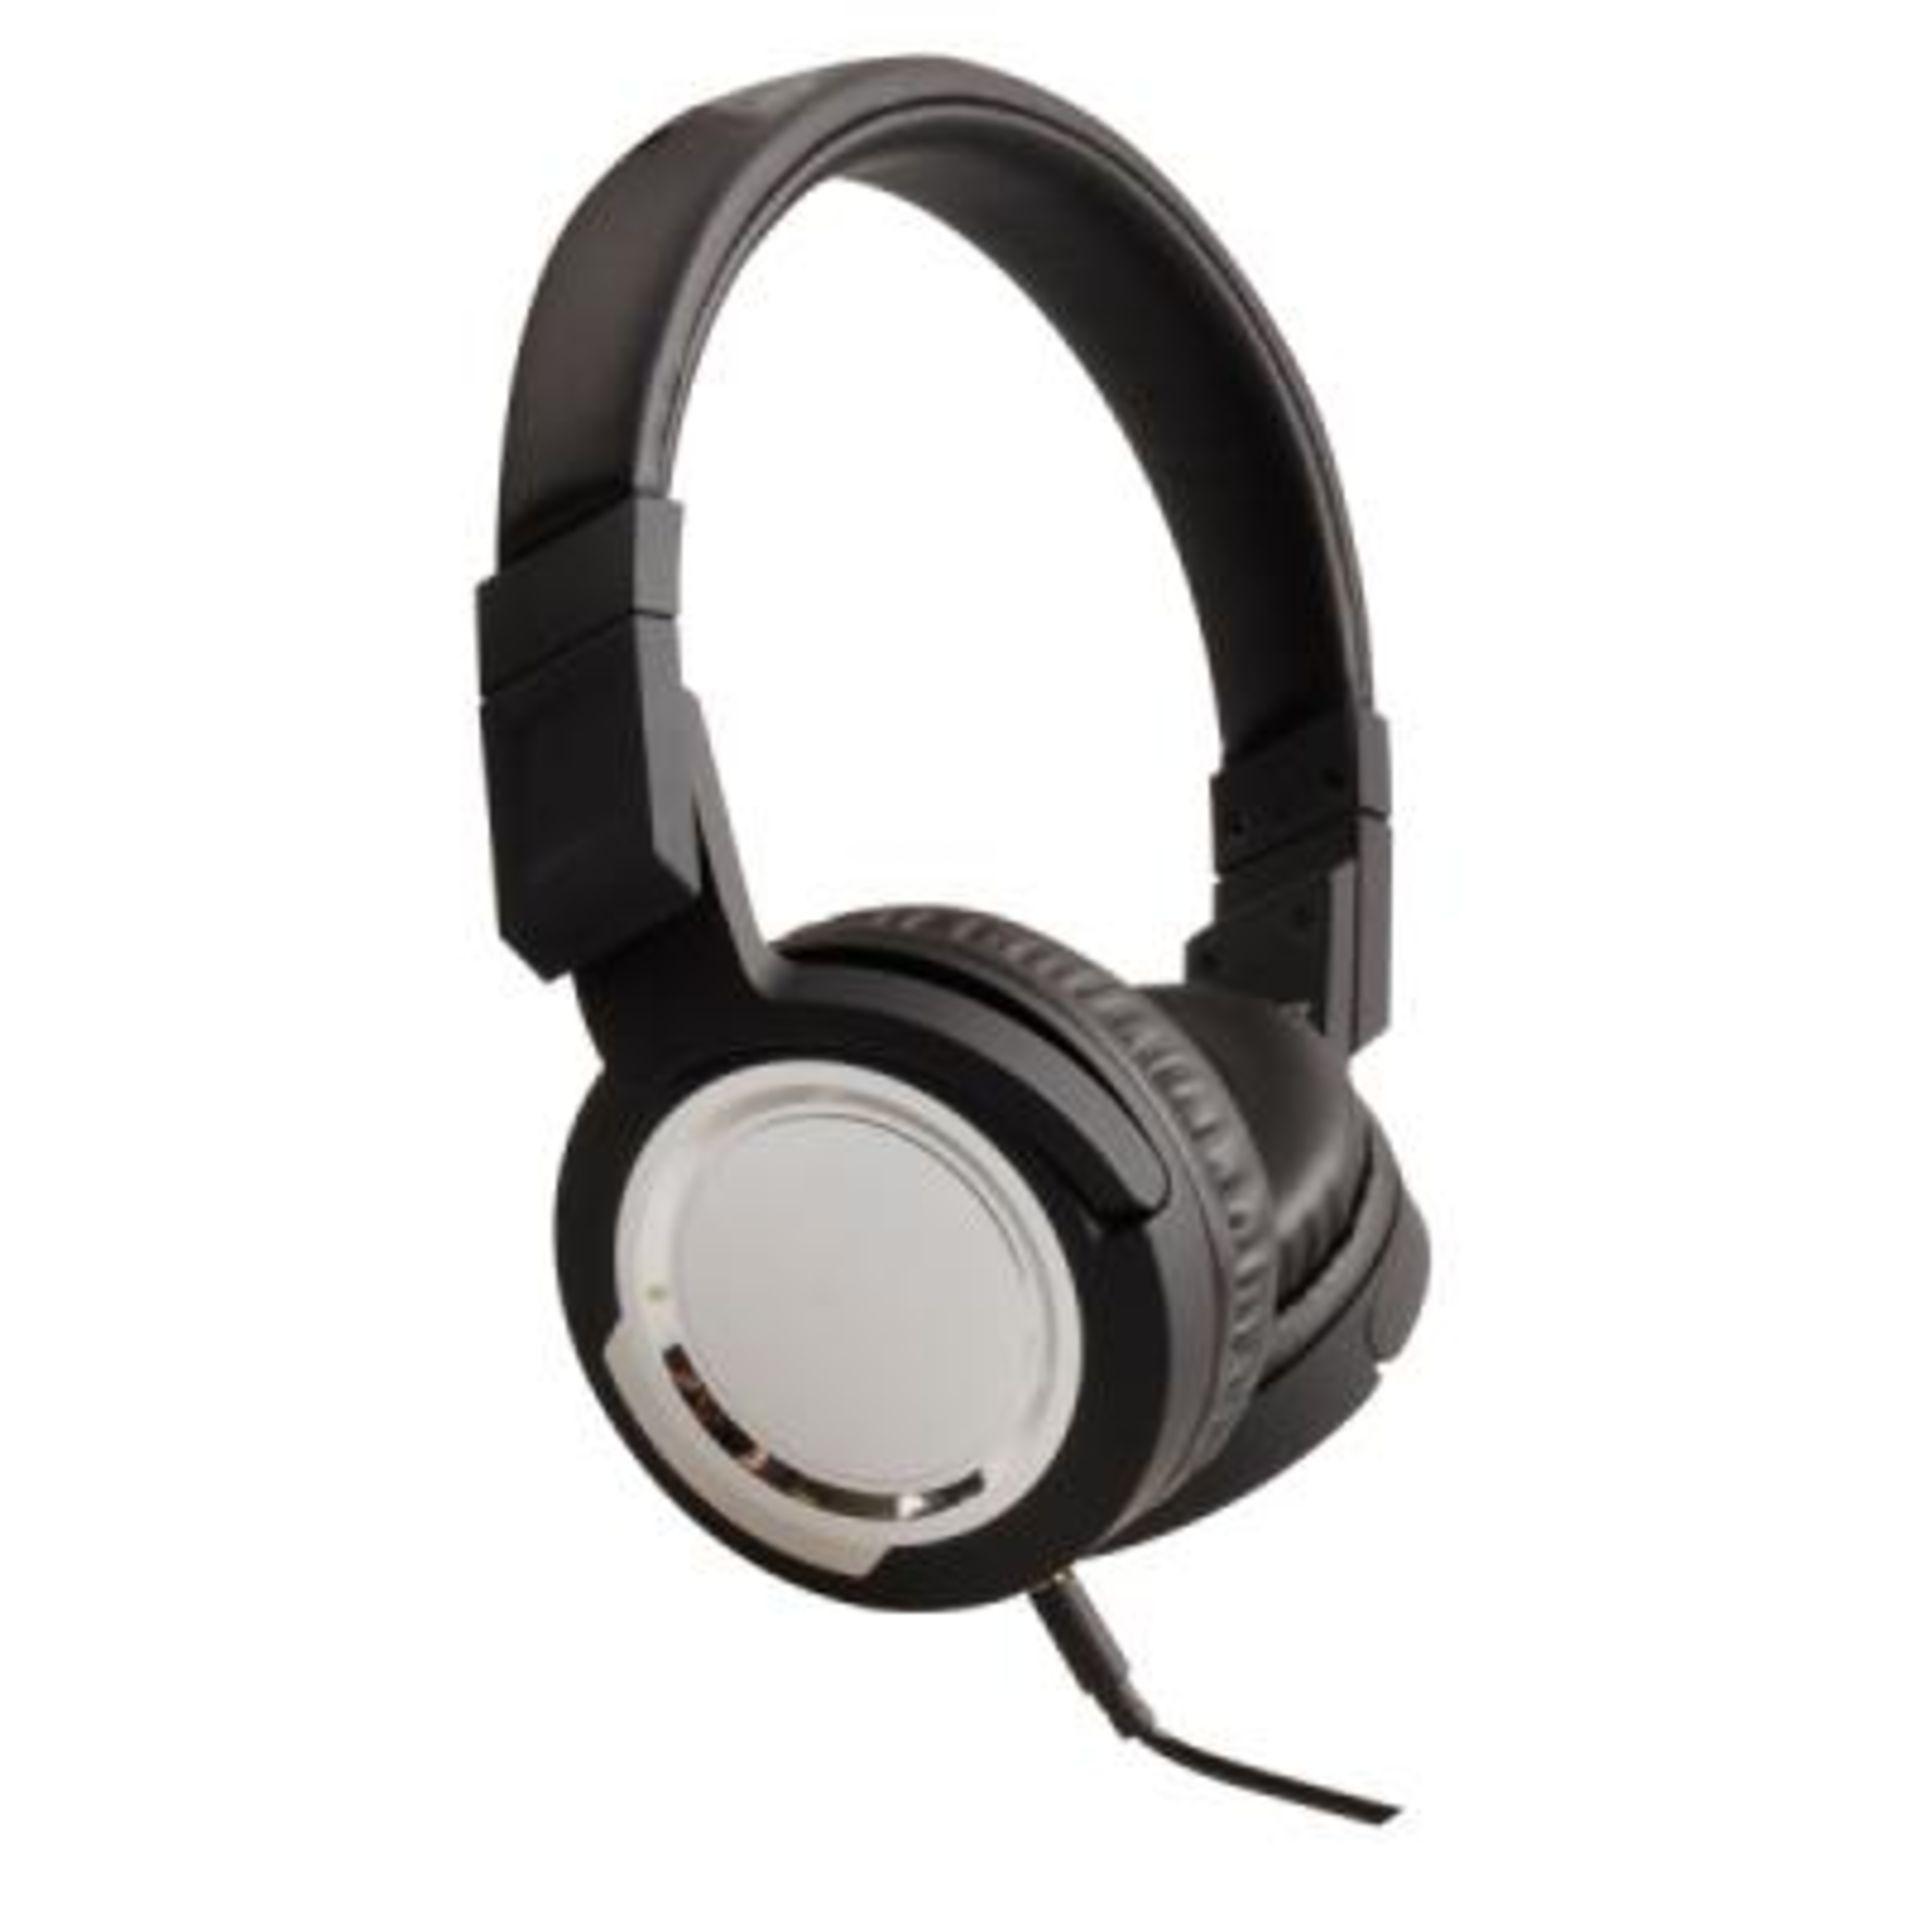 Lot 10796 - V Brand New On-Earz DJ Headset - High Definition - Crazy Bass & Crystal Clear Sound - Rotating Ear